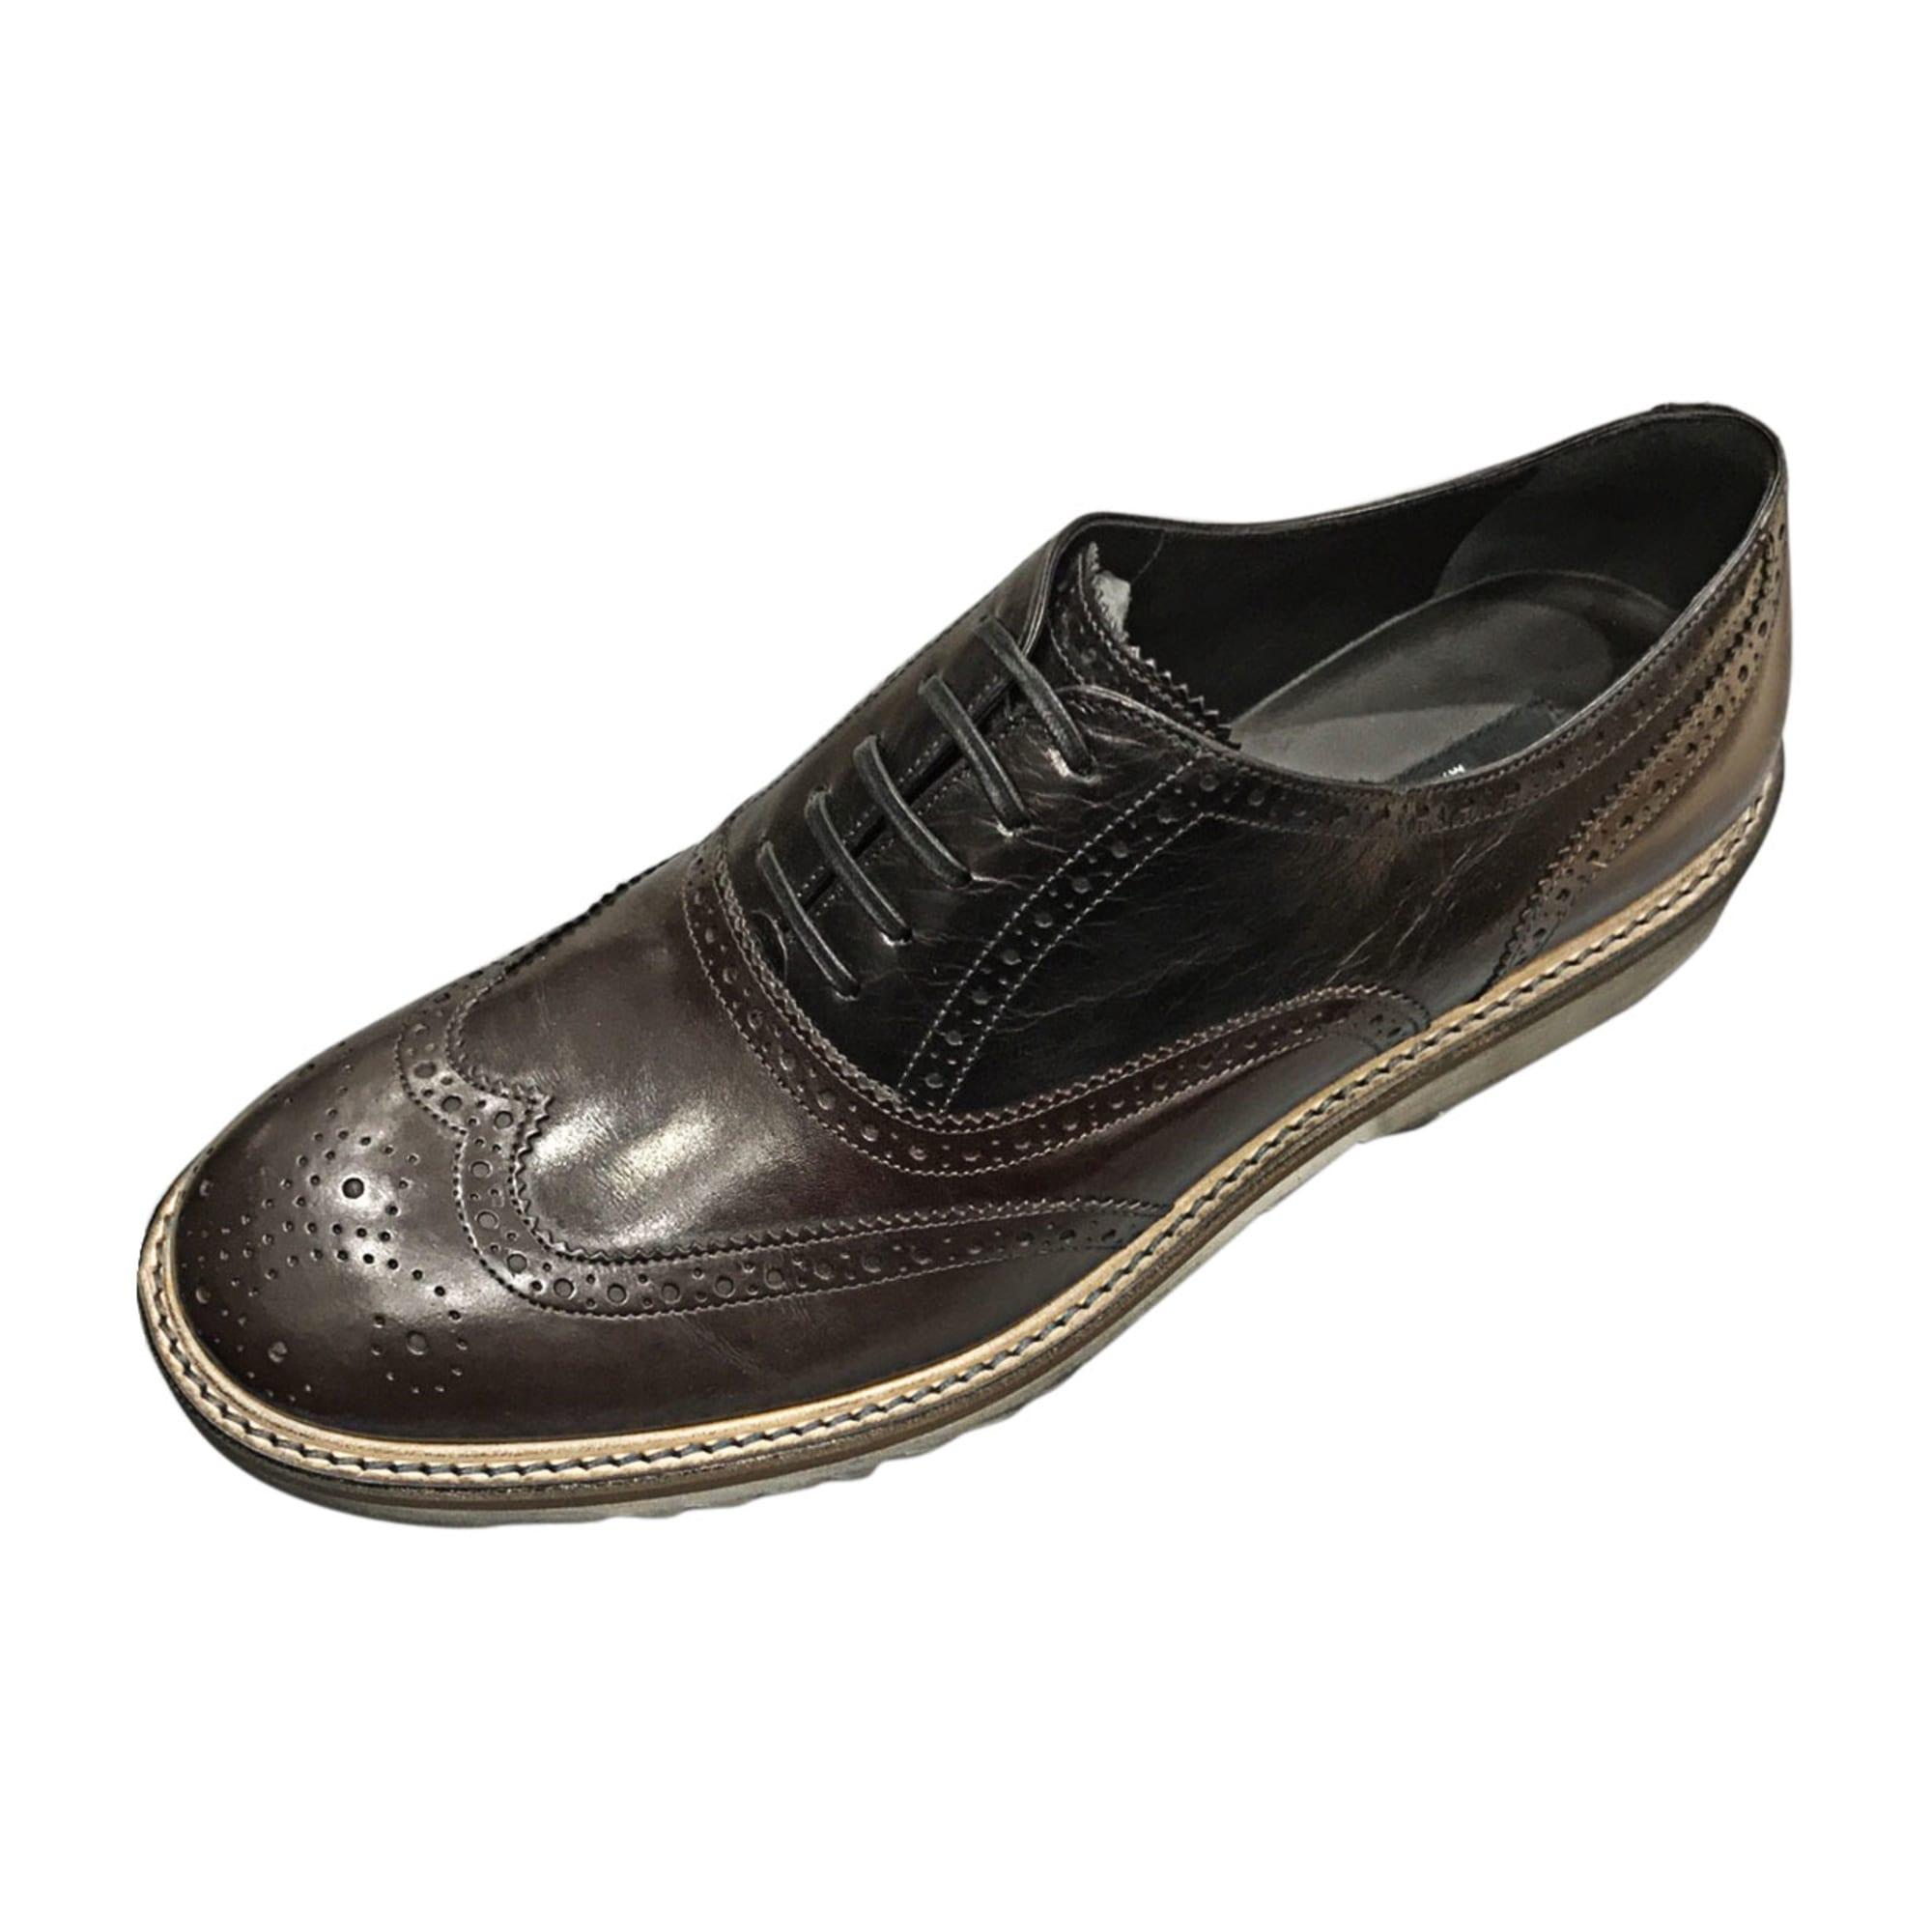 brand new 5075a fca0d Chaussures amp  42 lacets noir GABBANA à 5337005 DOLCE AxrqAT